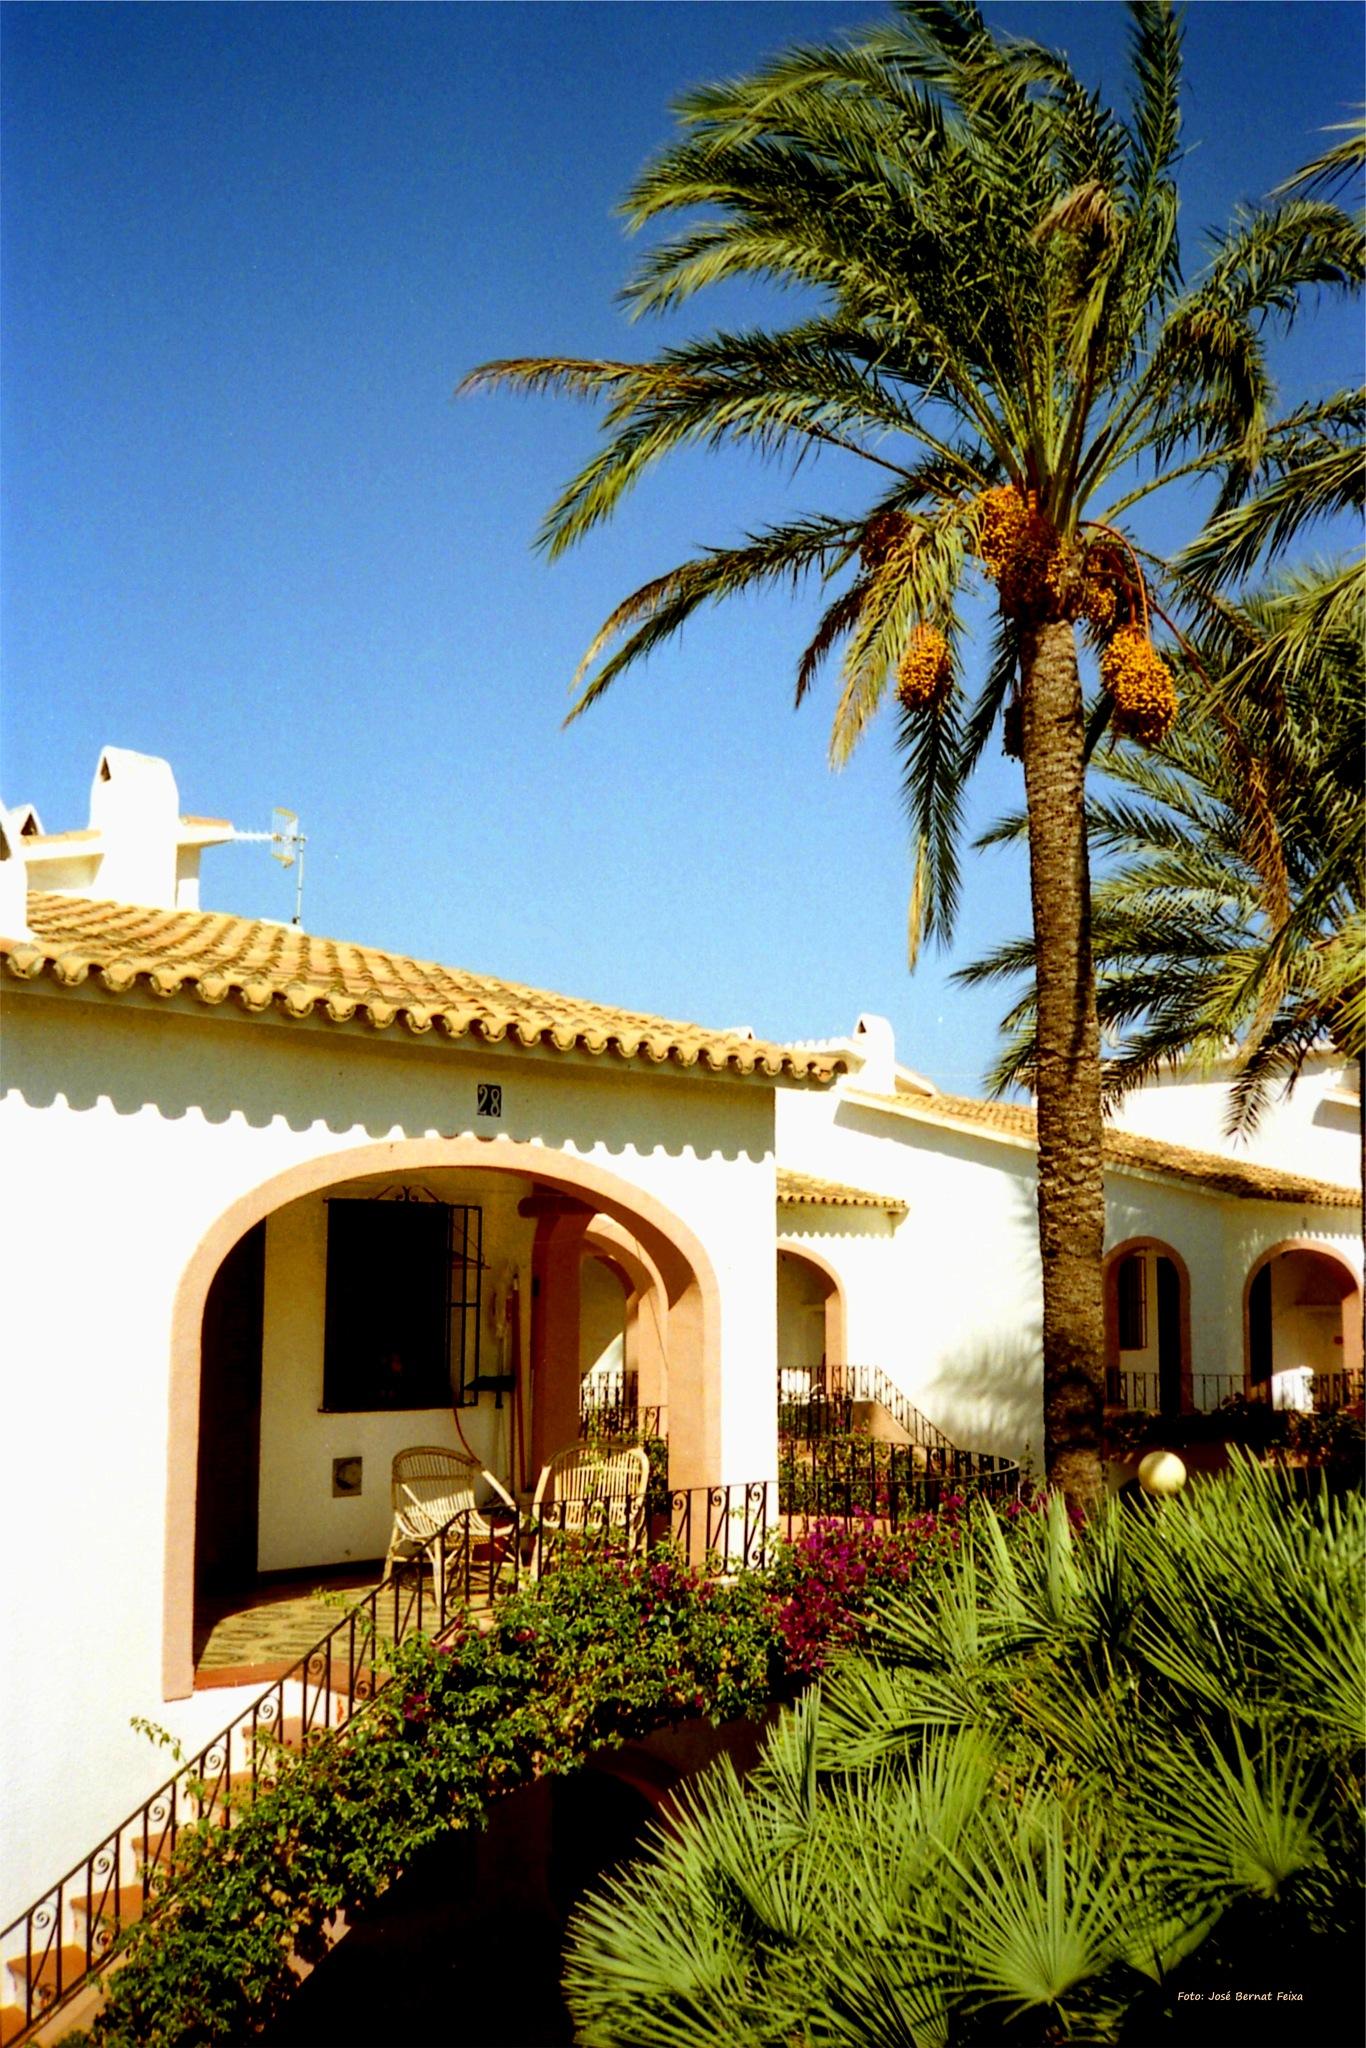 CASAS Y PALMERAS ; HUIZEN EN PALMBOMEN ; HOUSES AND PALM TREES by José Bernat Feixa